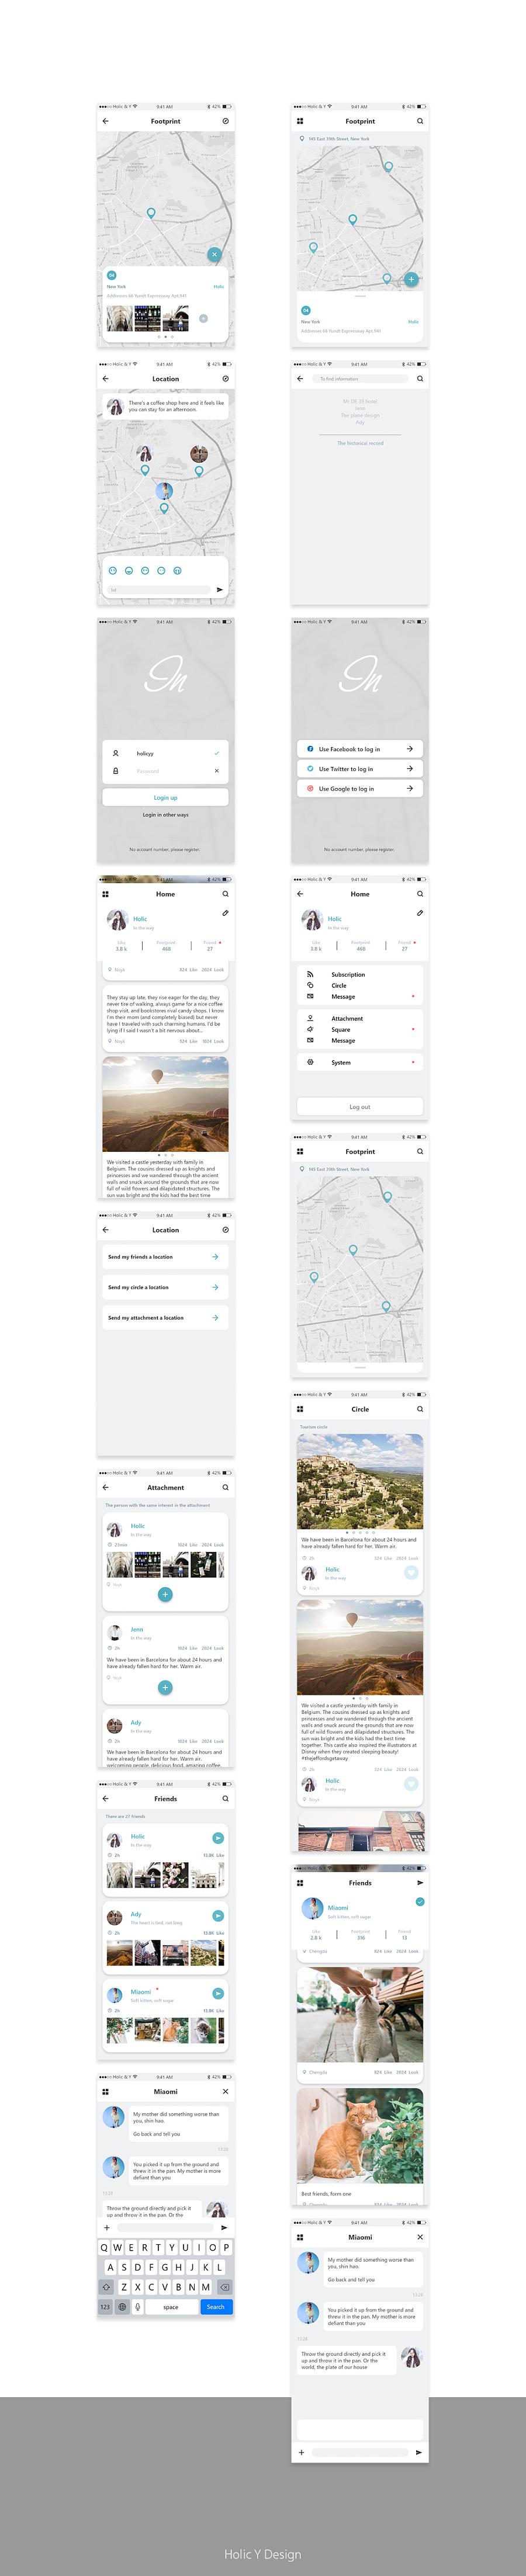 redesign:inmap|||zihoo - 原创设计作品 - 站酷图片